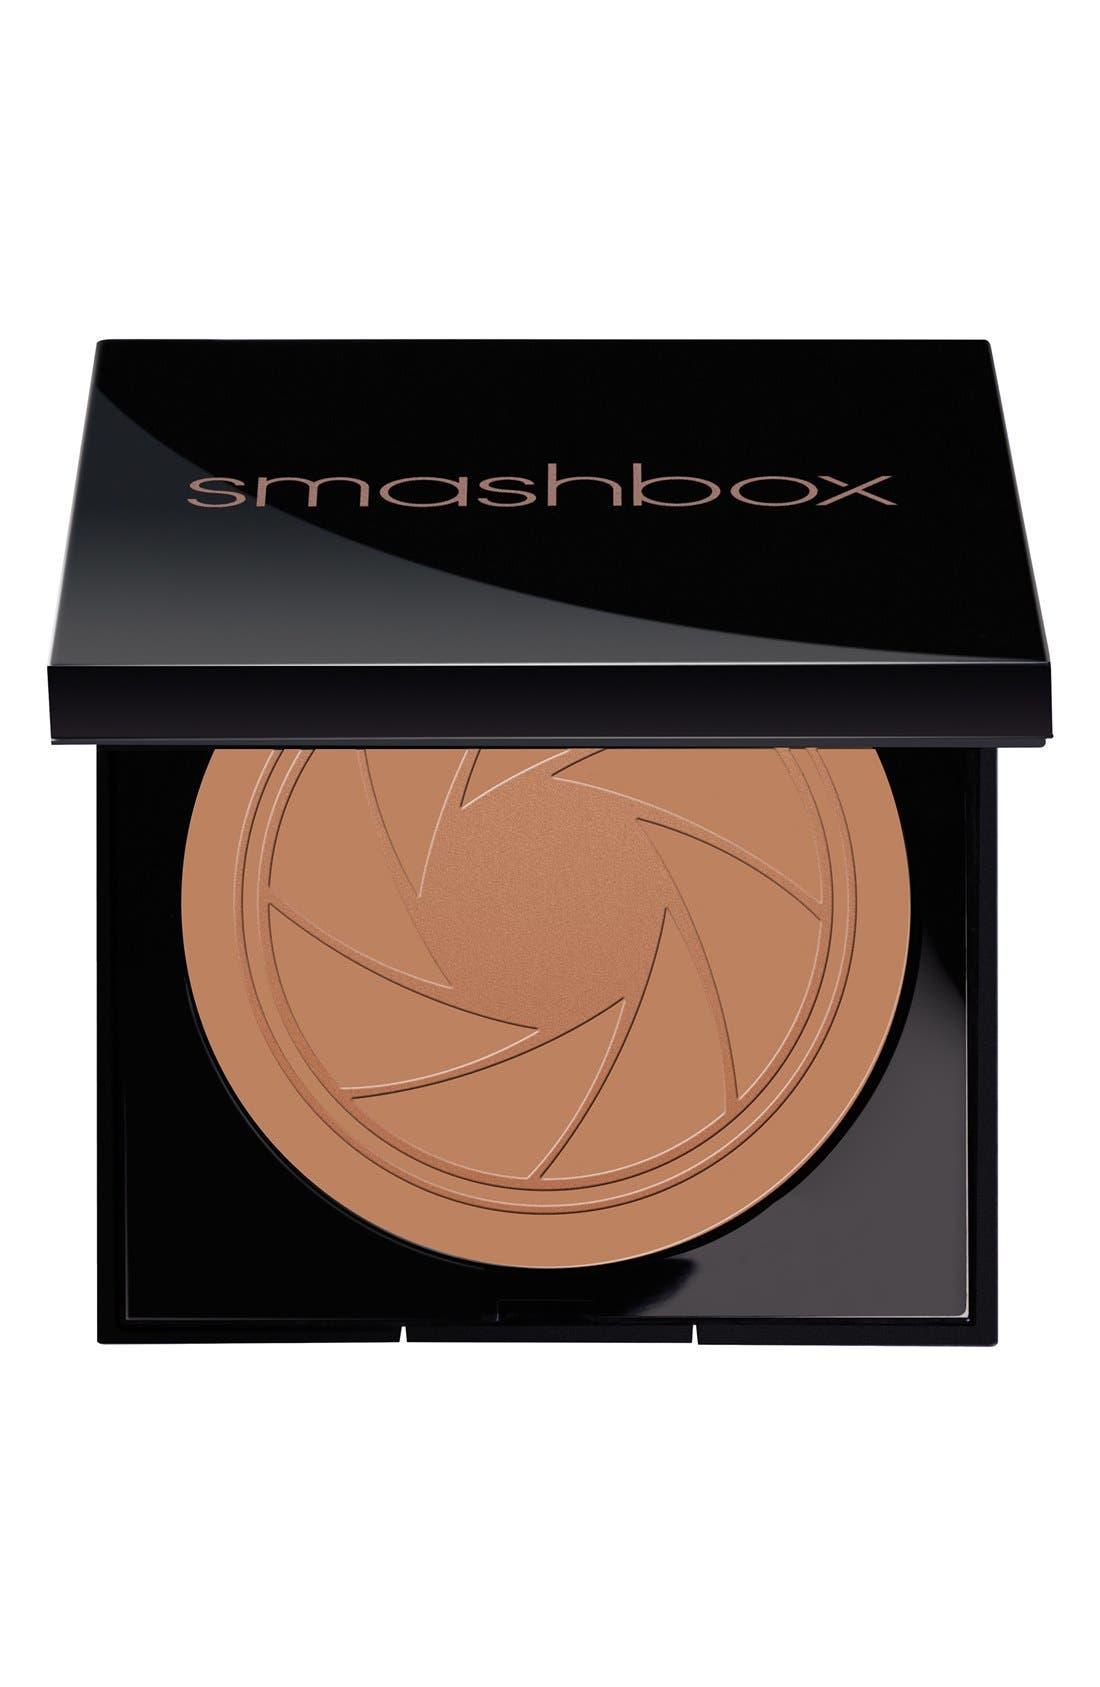 SMASHBOX, Bronze Lights Bronzer, Main thumbnail 1, color, 200